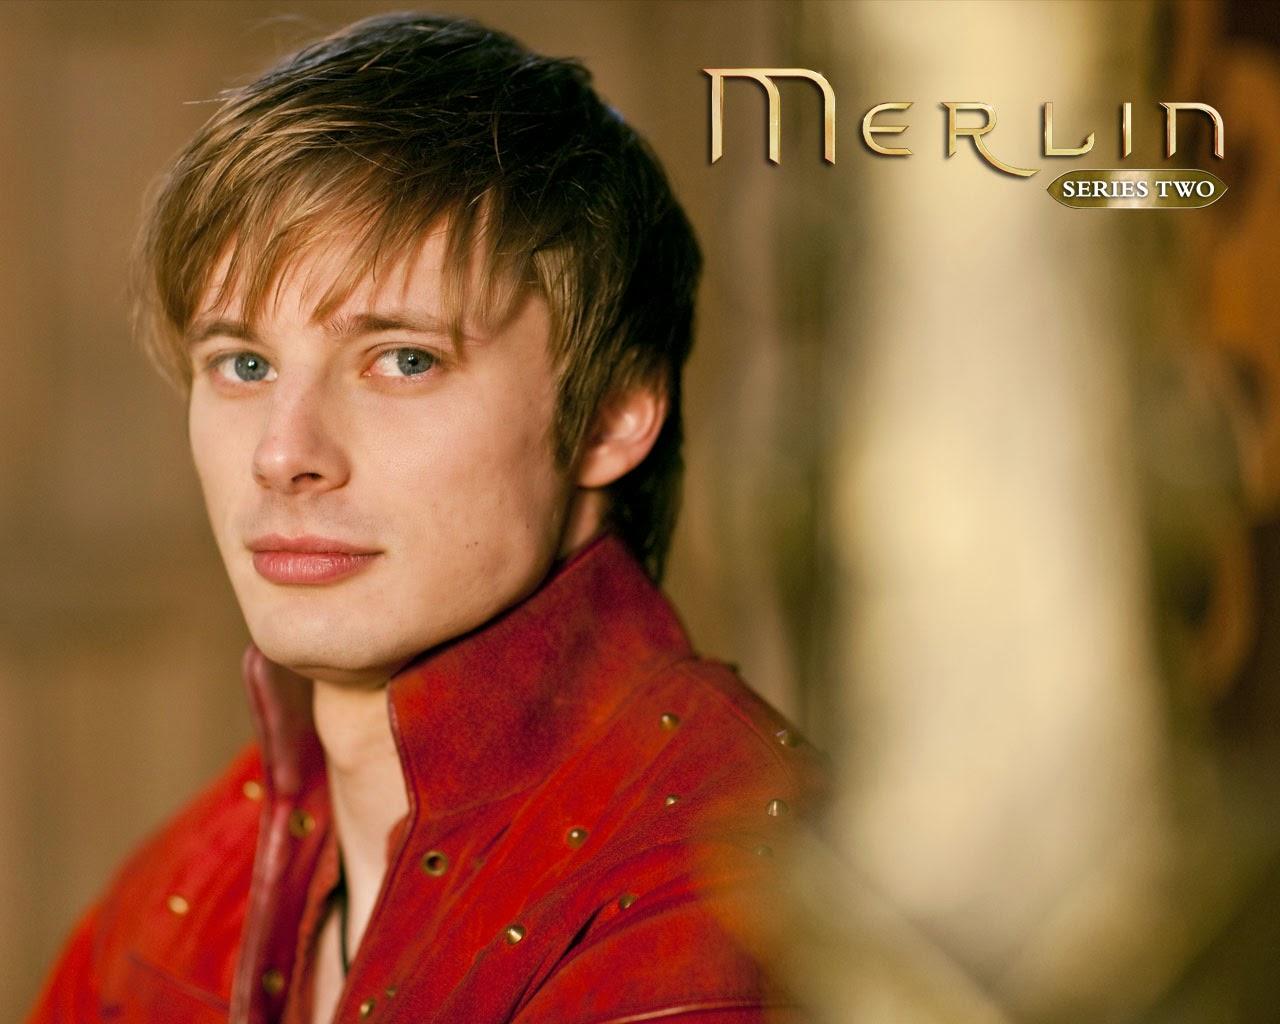 The adventures of merlin season 2